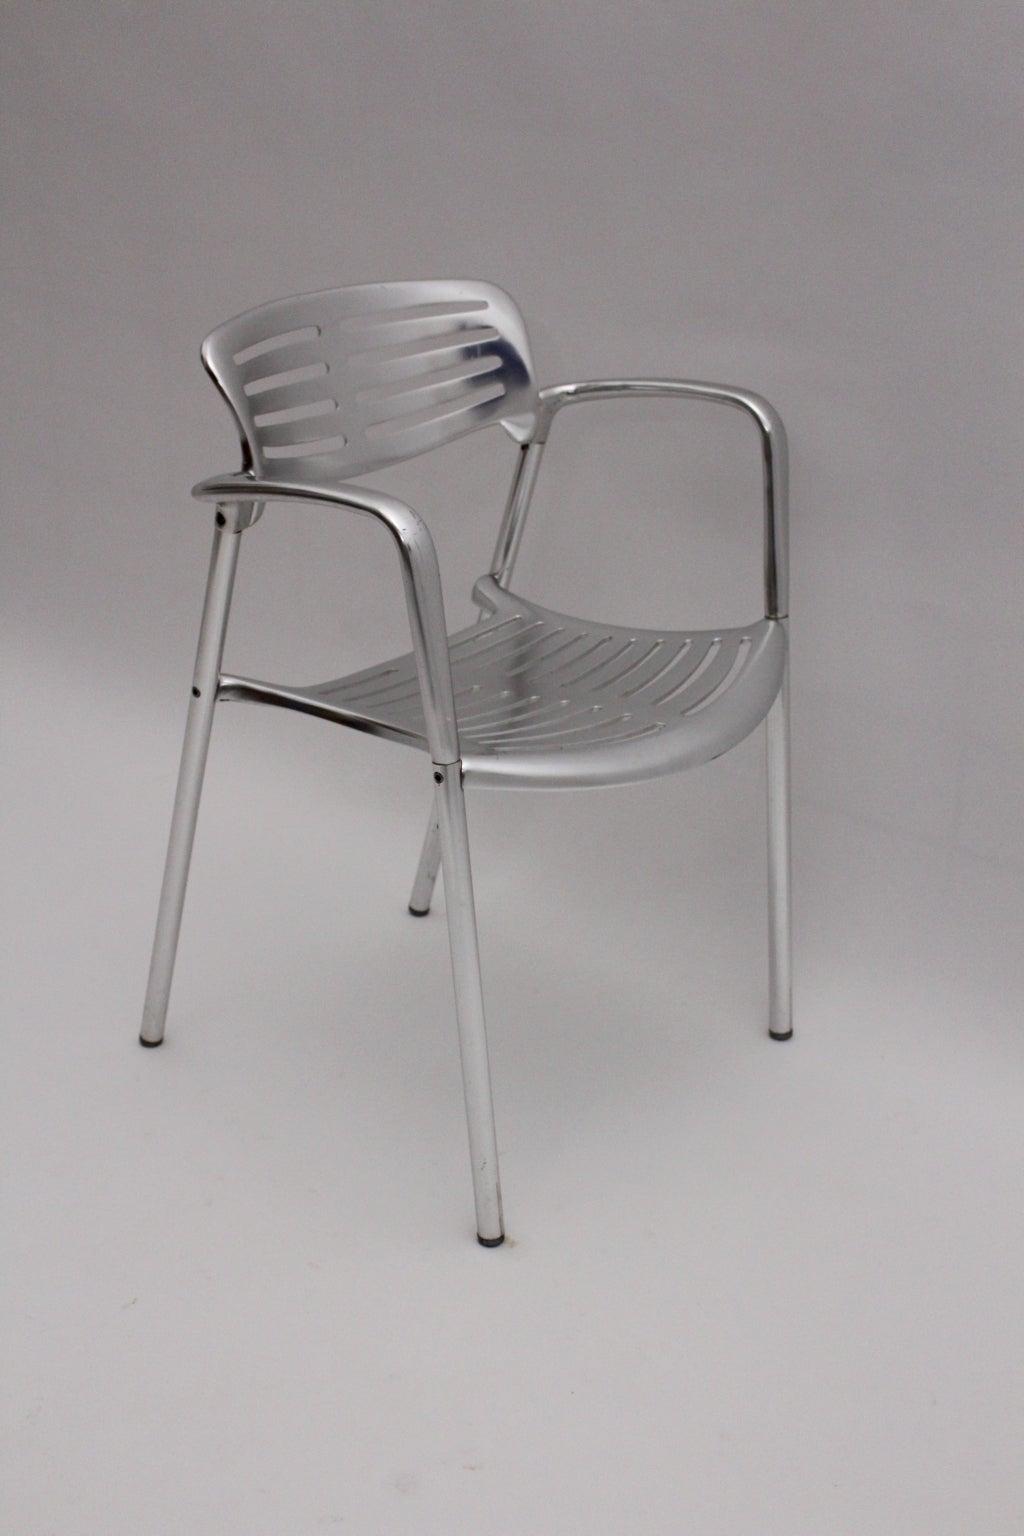 Modernist Metal Vintage Chairs Toledo by Jorge Pensi  Spain 1986-1988 For Sale 1